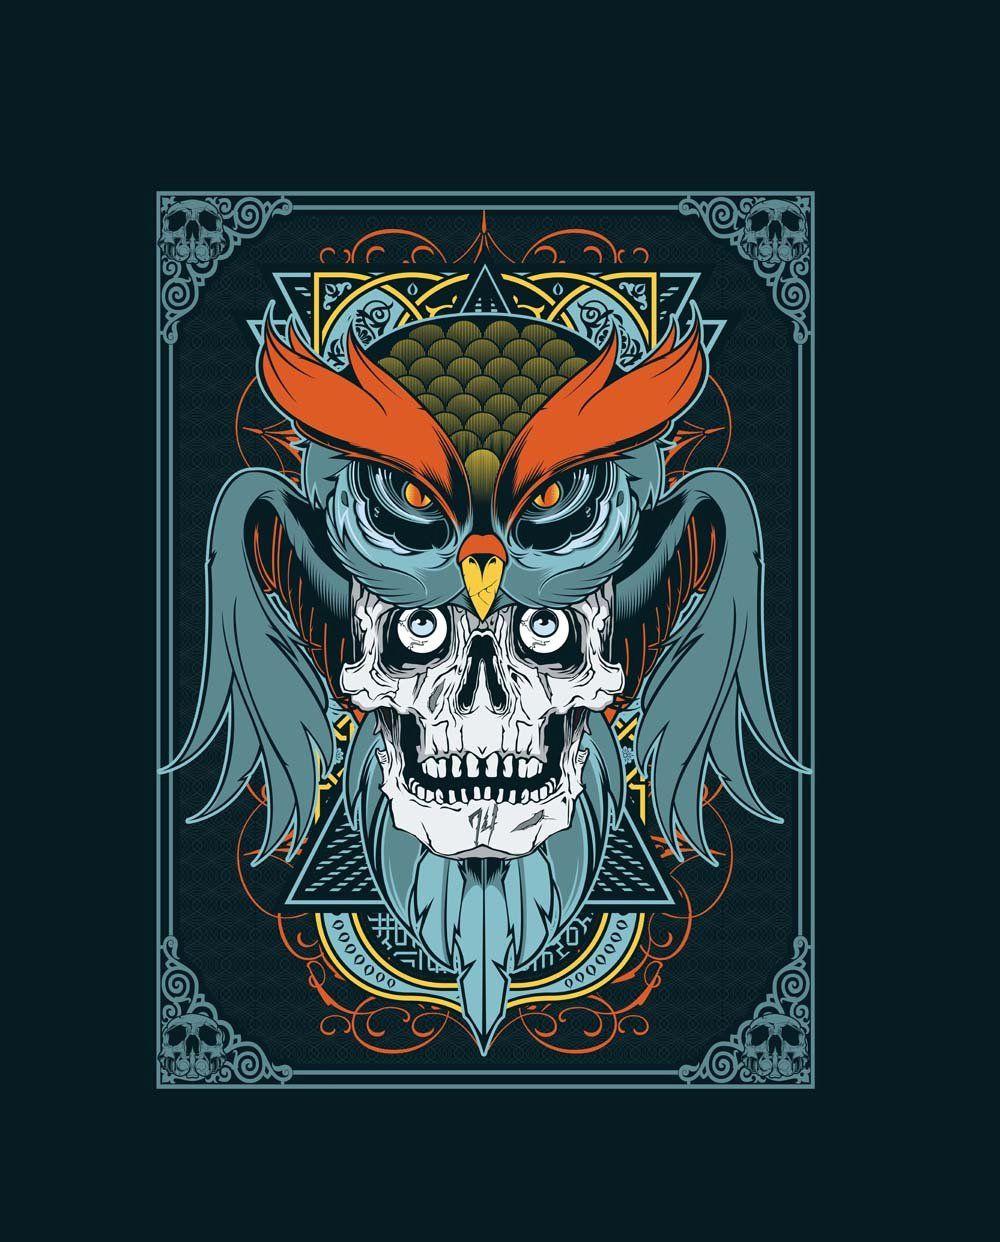 Design t shirt artwork - Adobe Illustrator Photoshop Tutorial T Shirt Design In Illustrator Using Owl And Skull Vector Art Use Illustrator To Draw A Biker Style Graphic Using